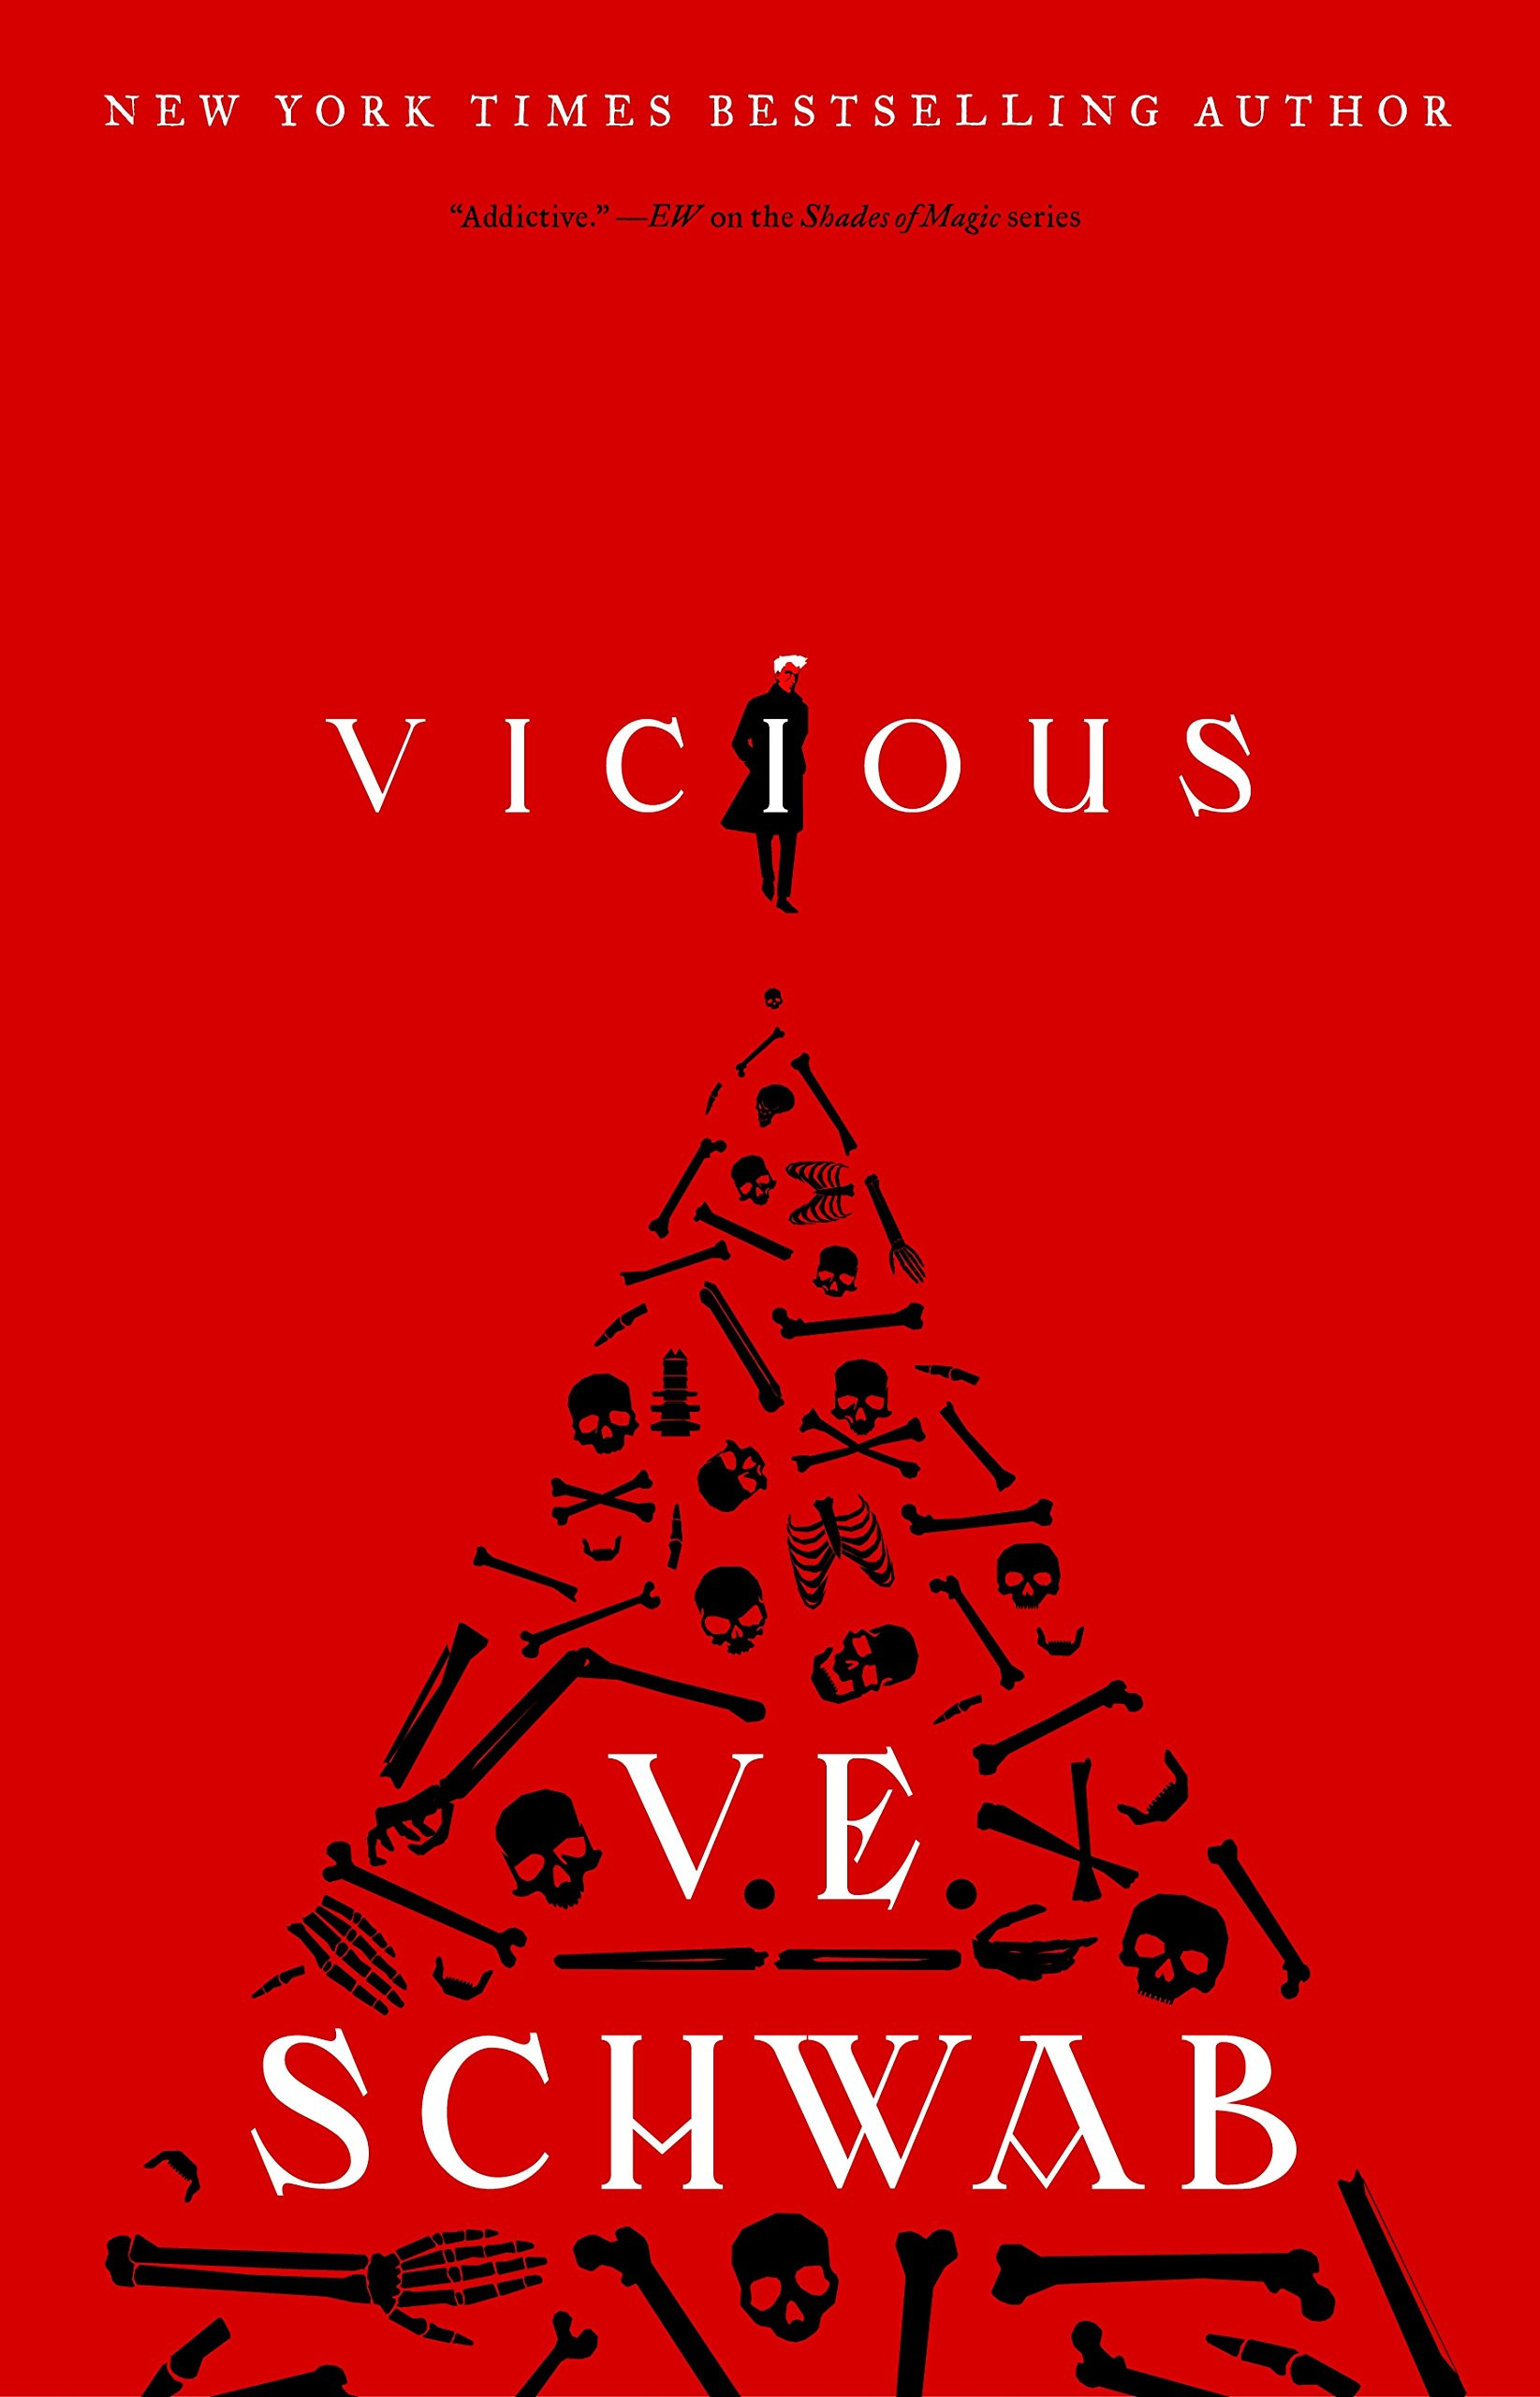 Vicious (Villains #1) by V.E. Schwab Review